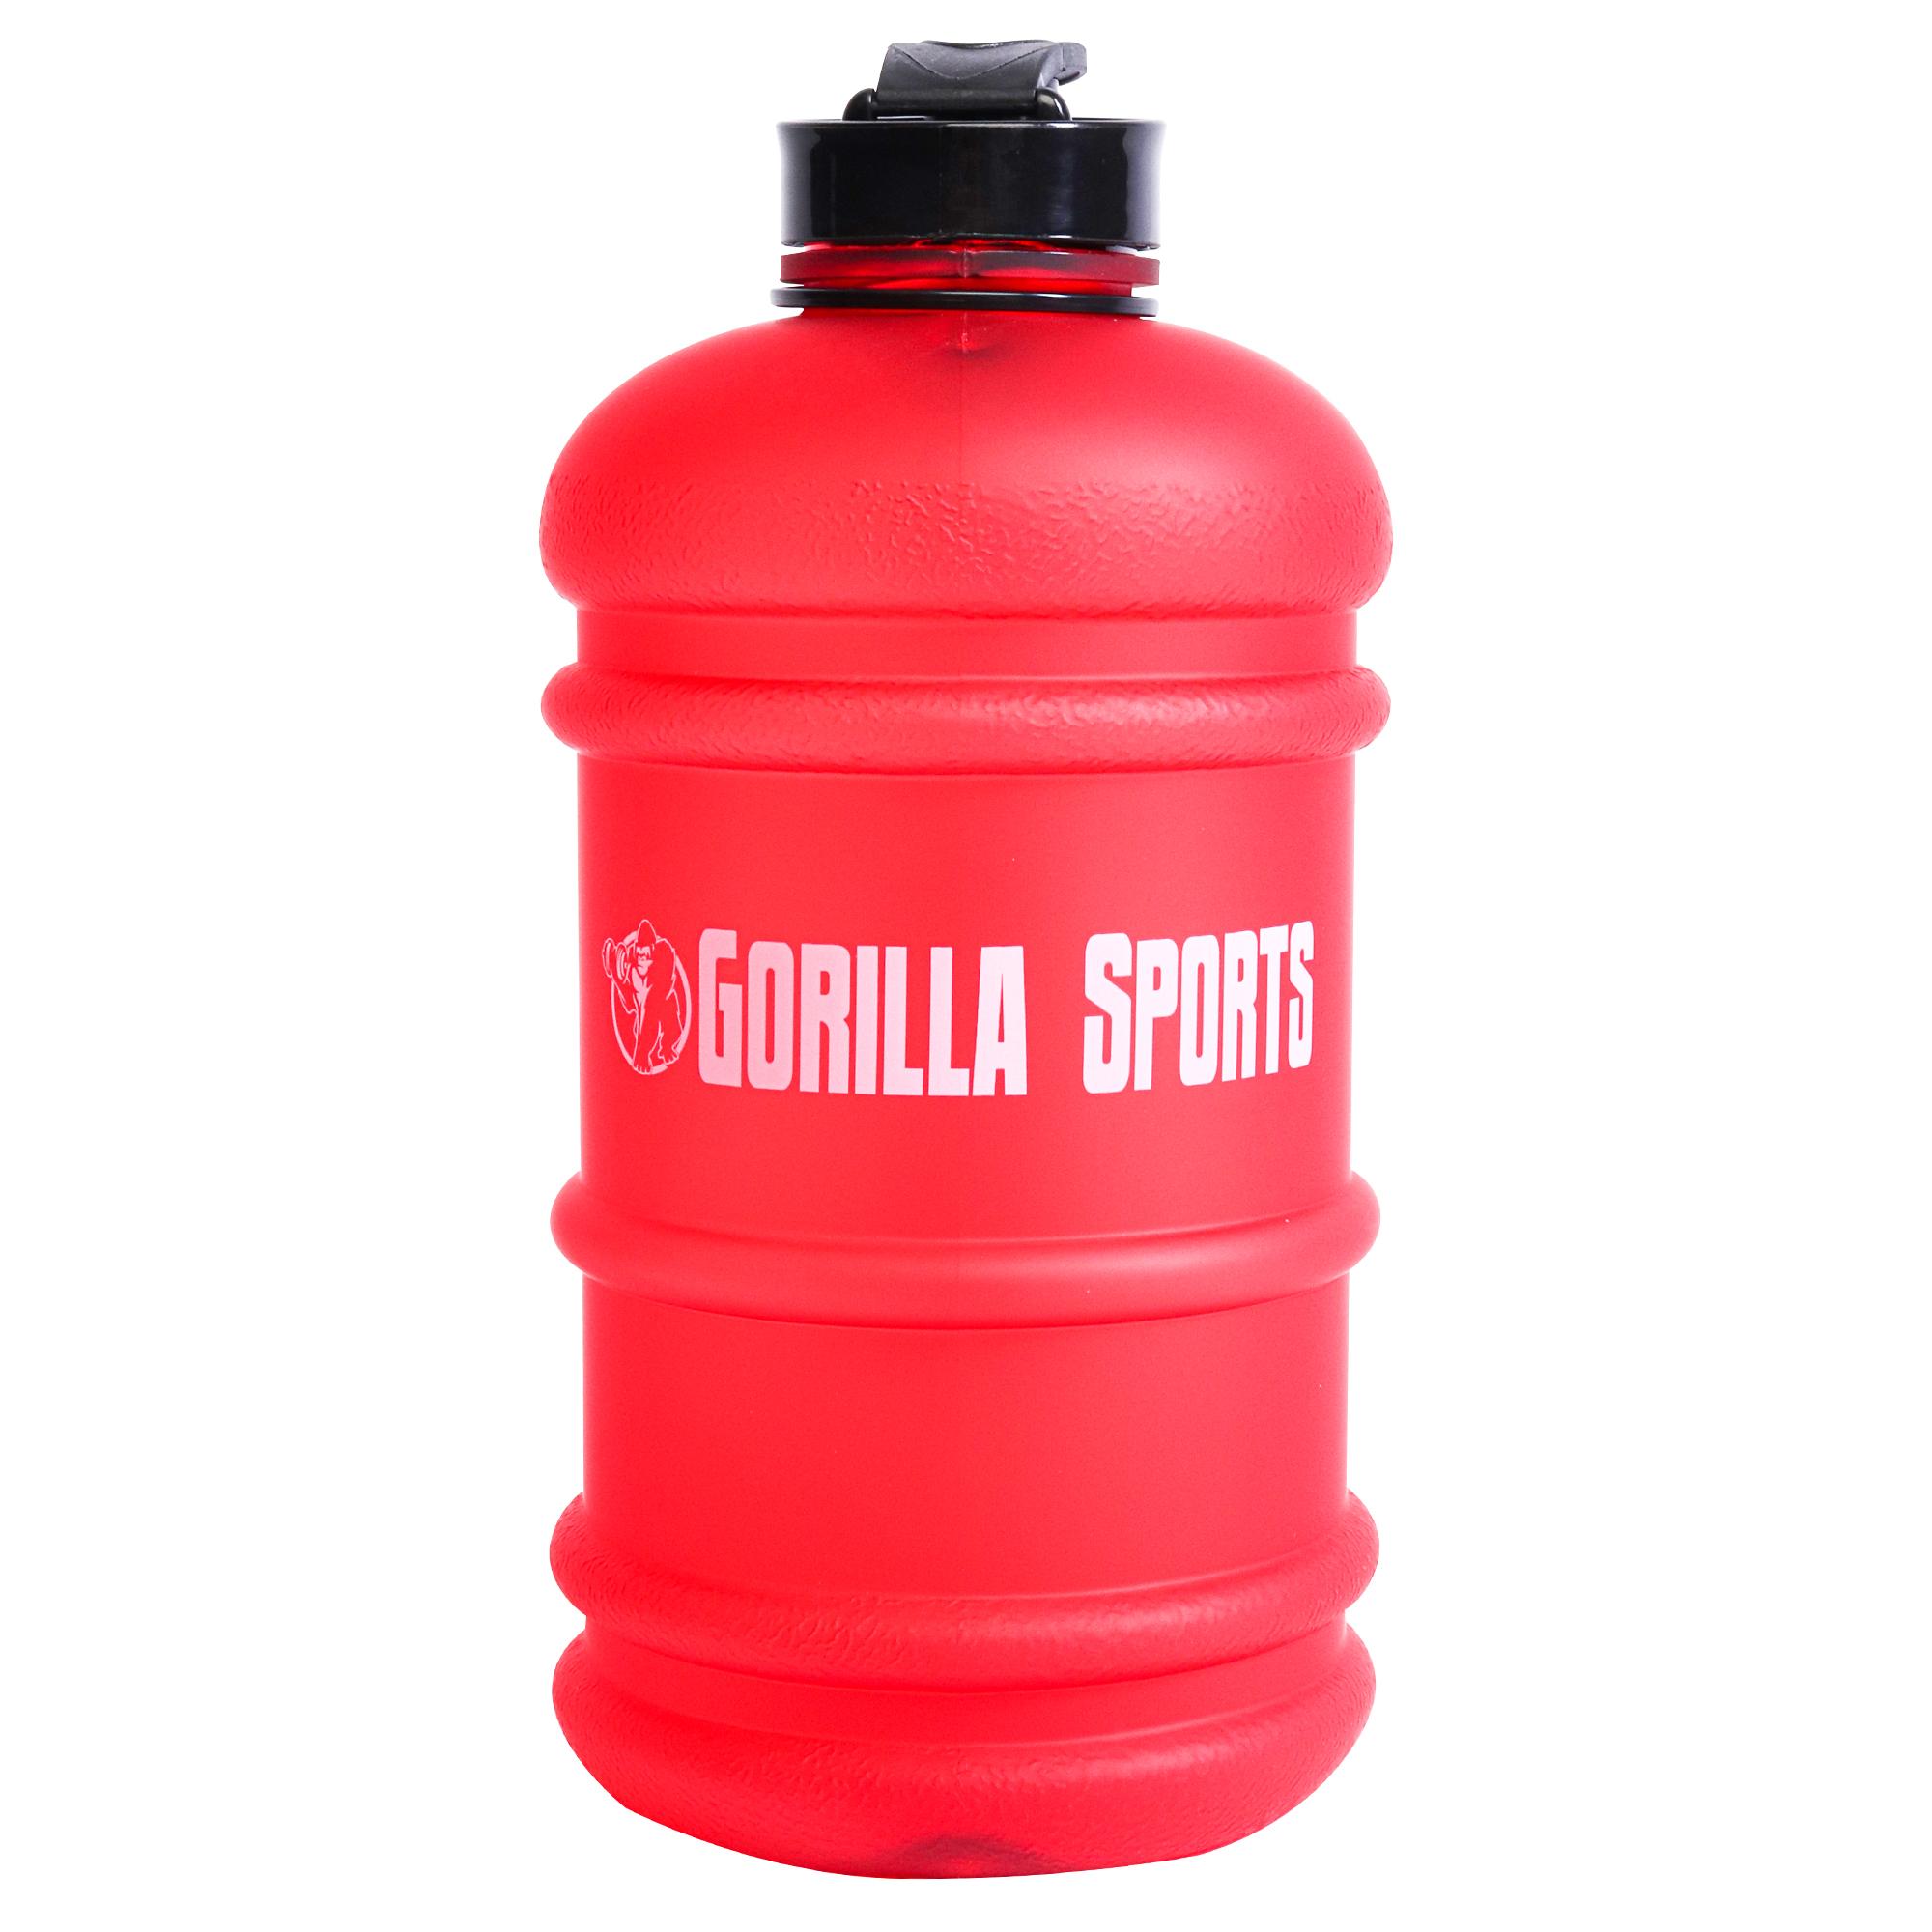 Gorilla Sports Trinkflasche Gallone 2,2 L Rot 101070-00038-0138